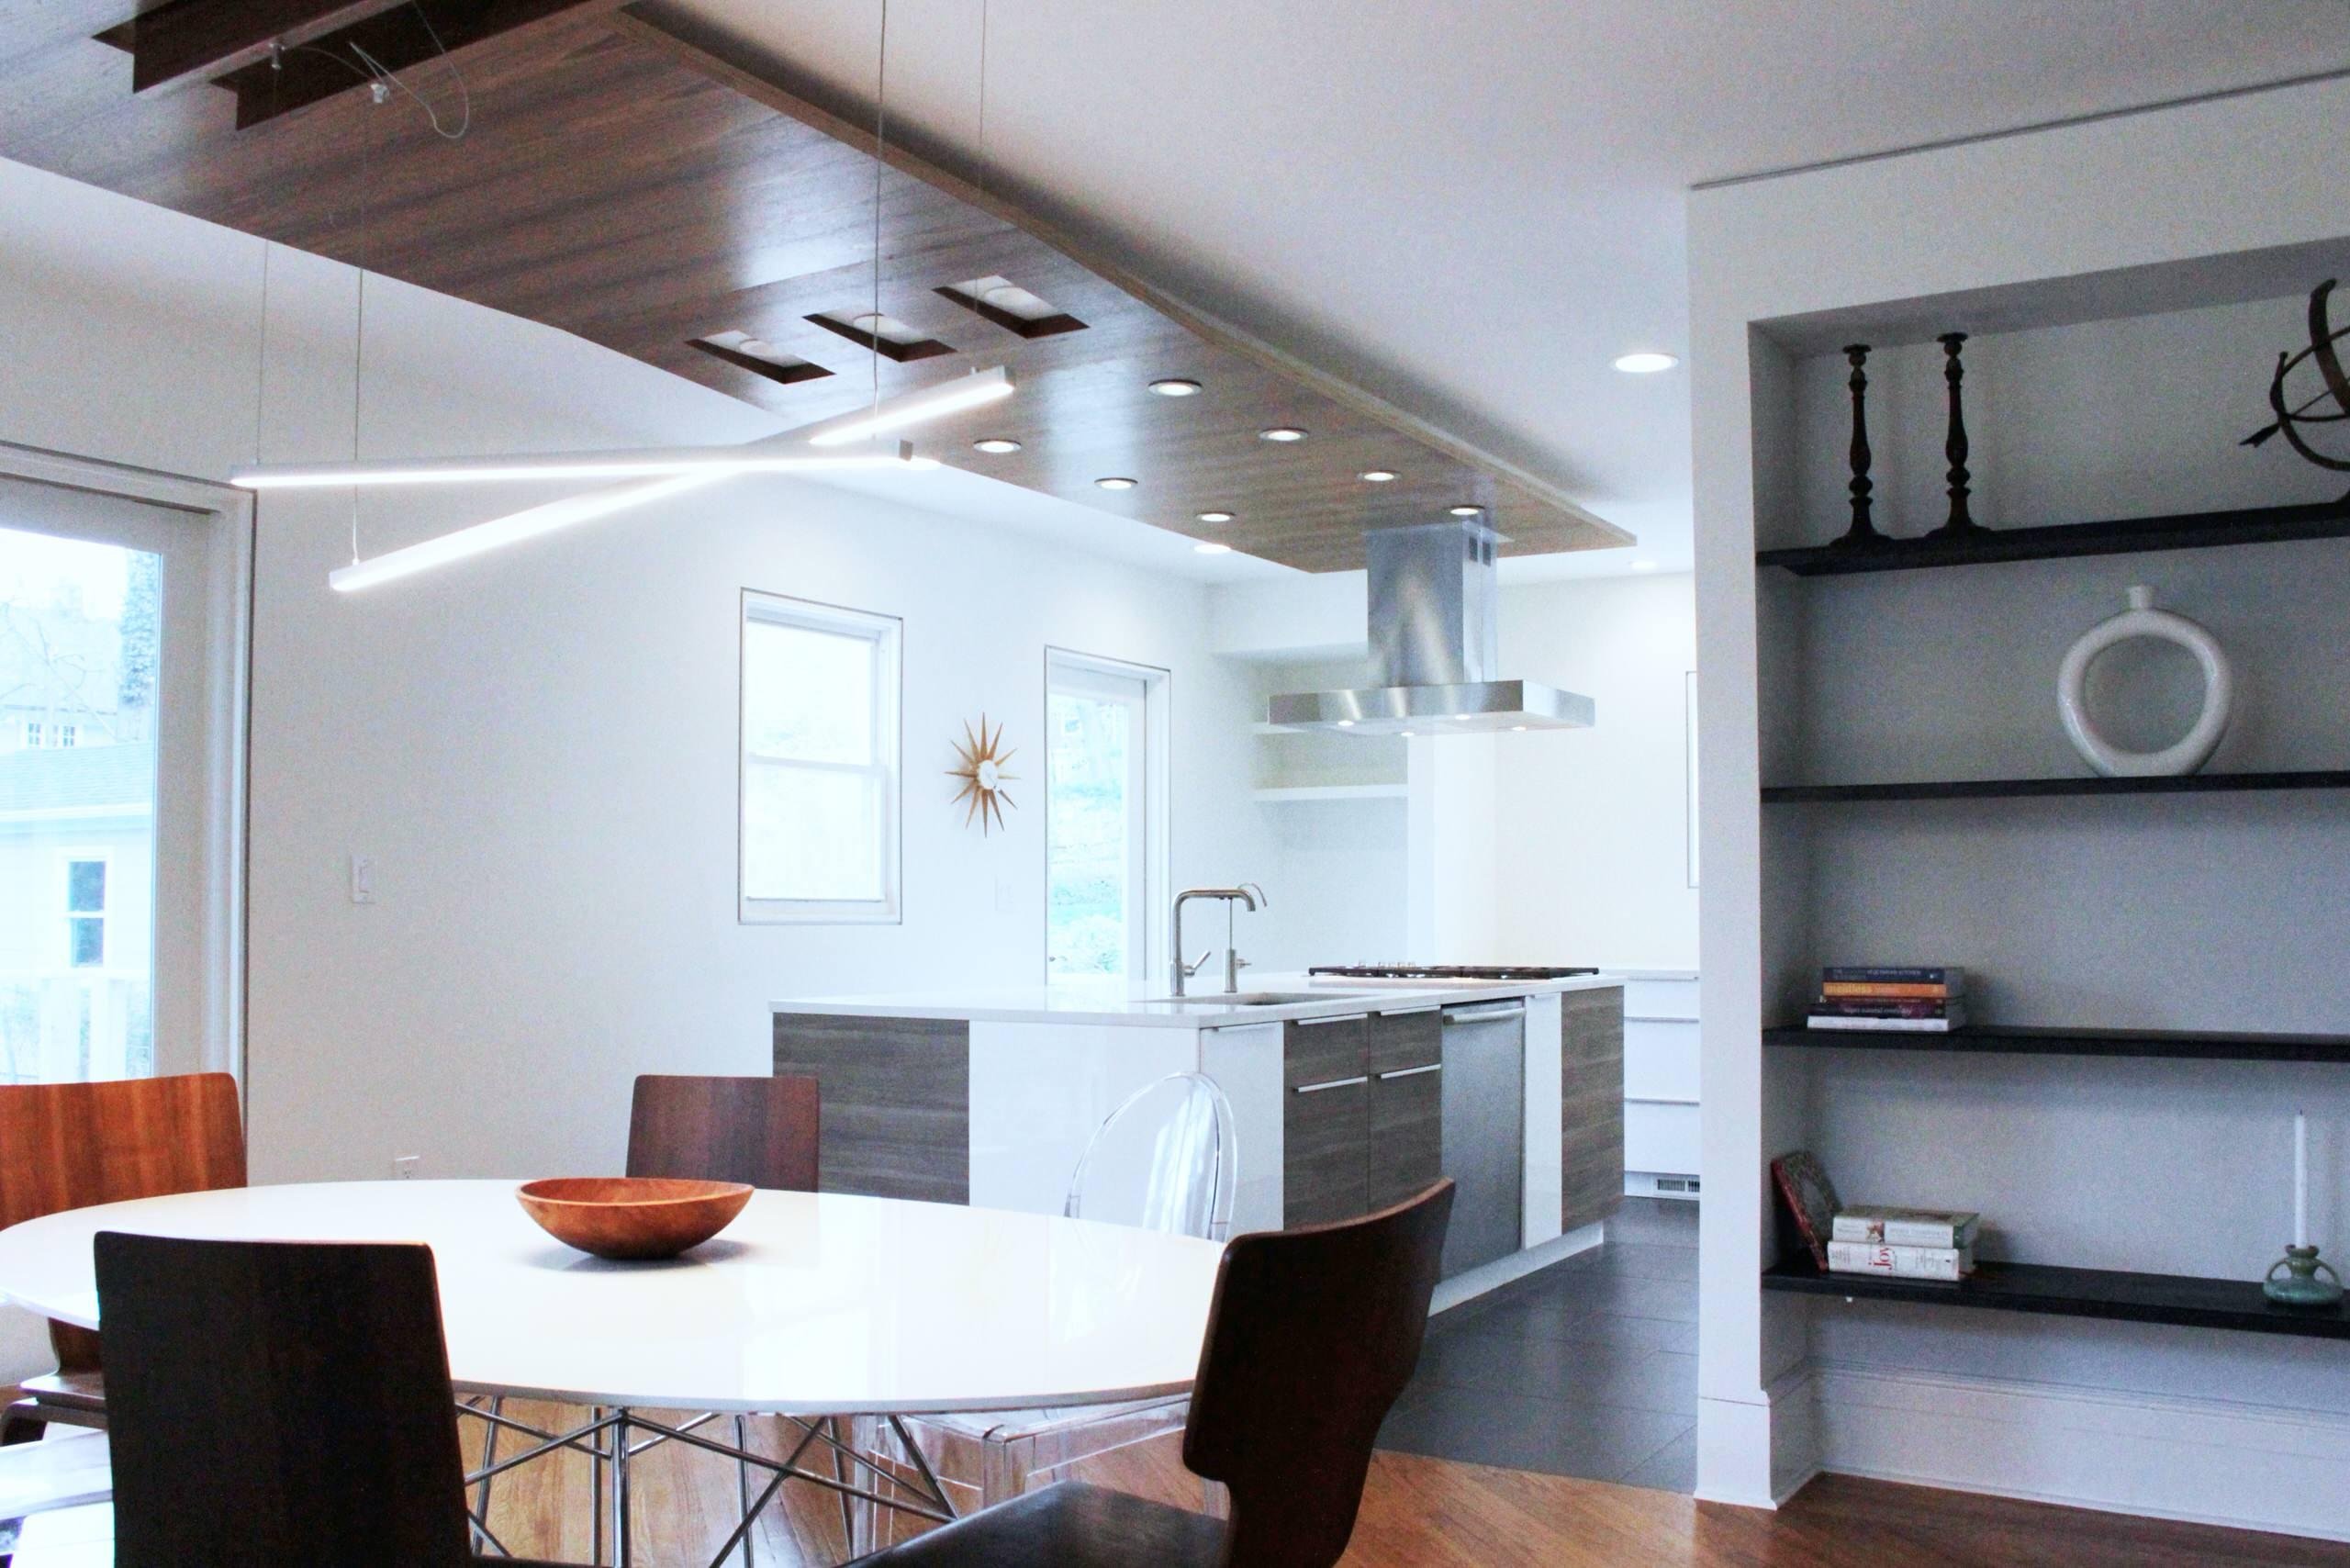 Beyond Function Kitchen